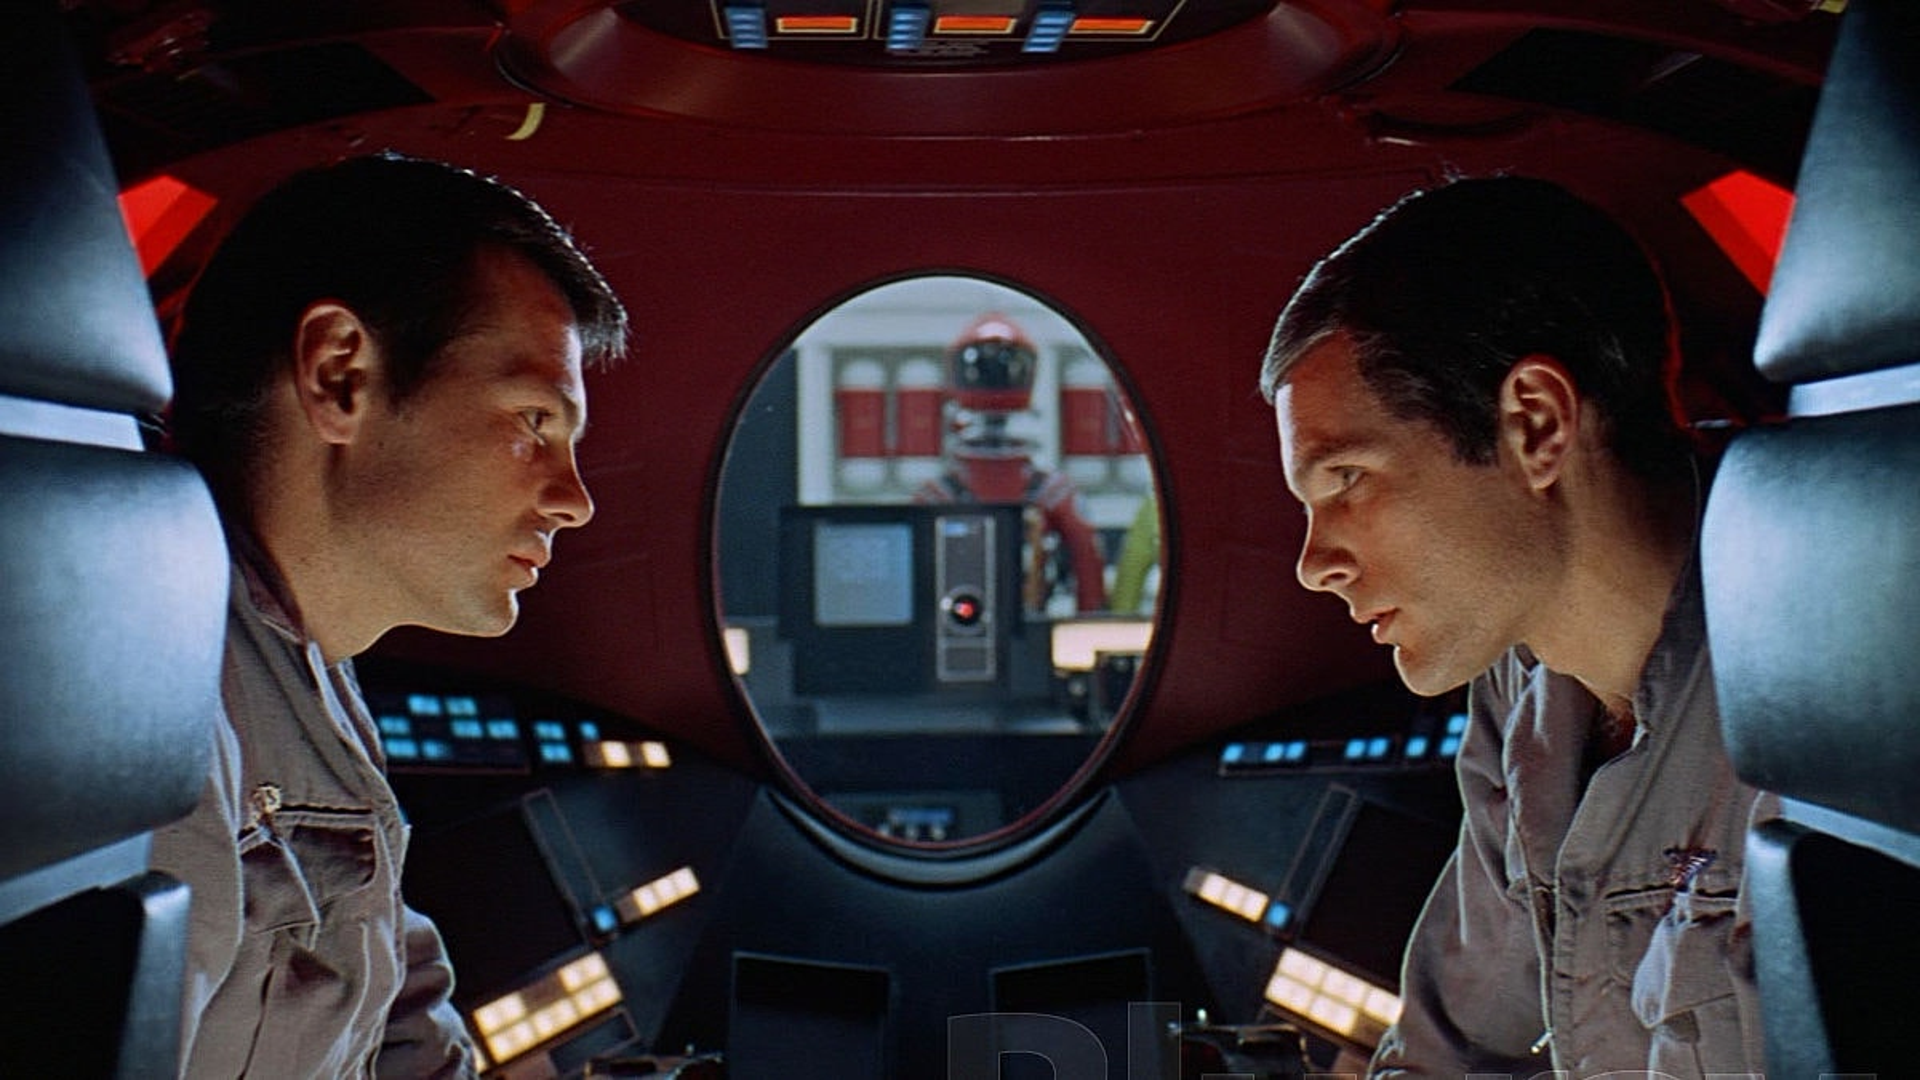 2001 a space odyssey sequel